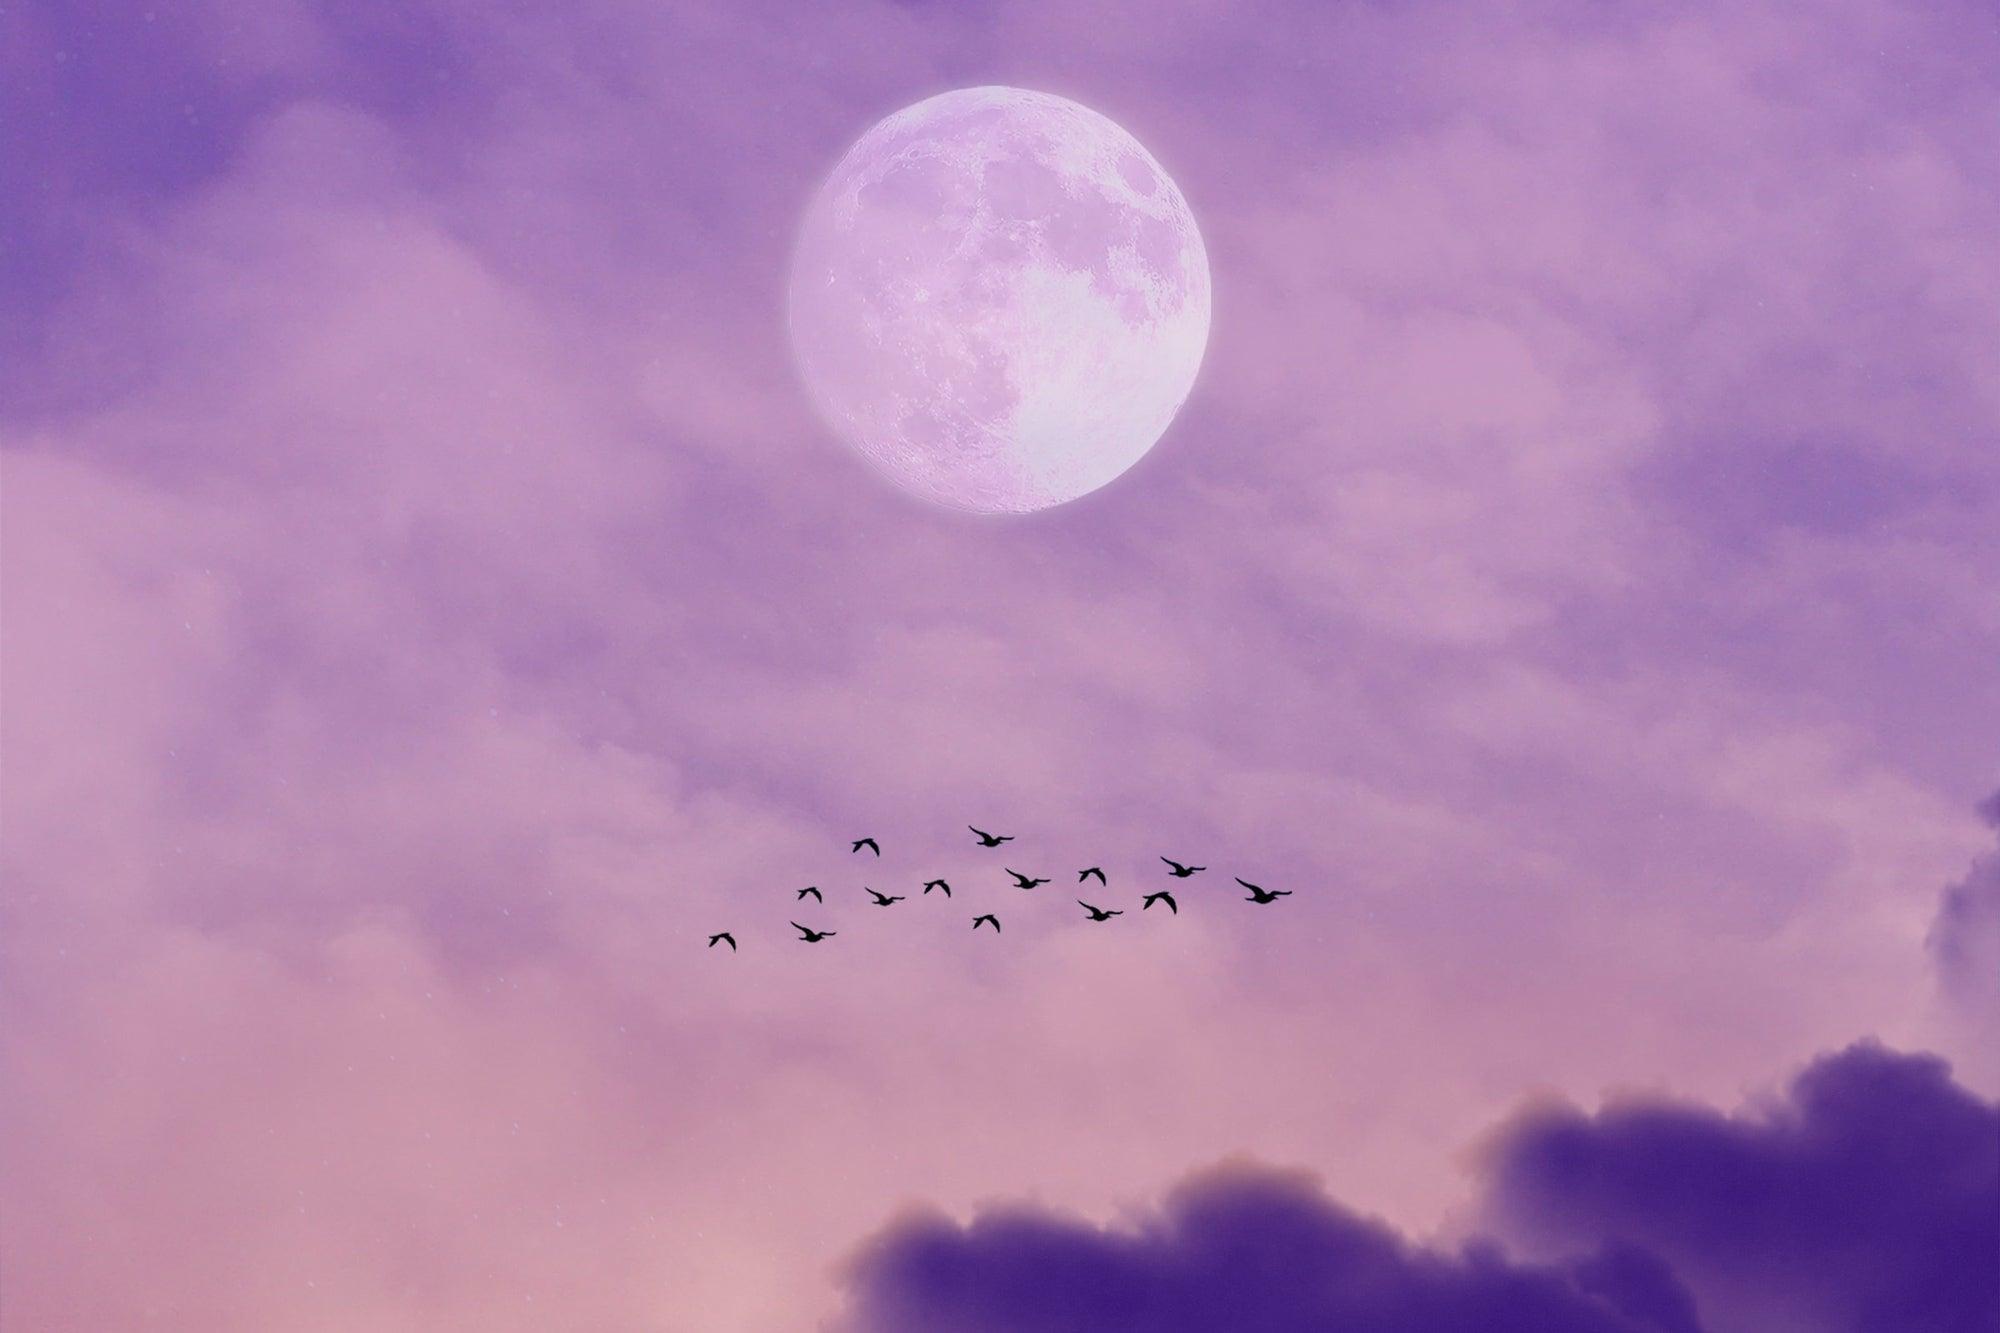 birds flying under the moon